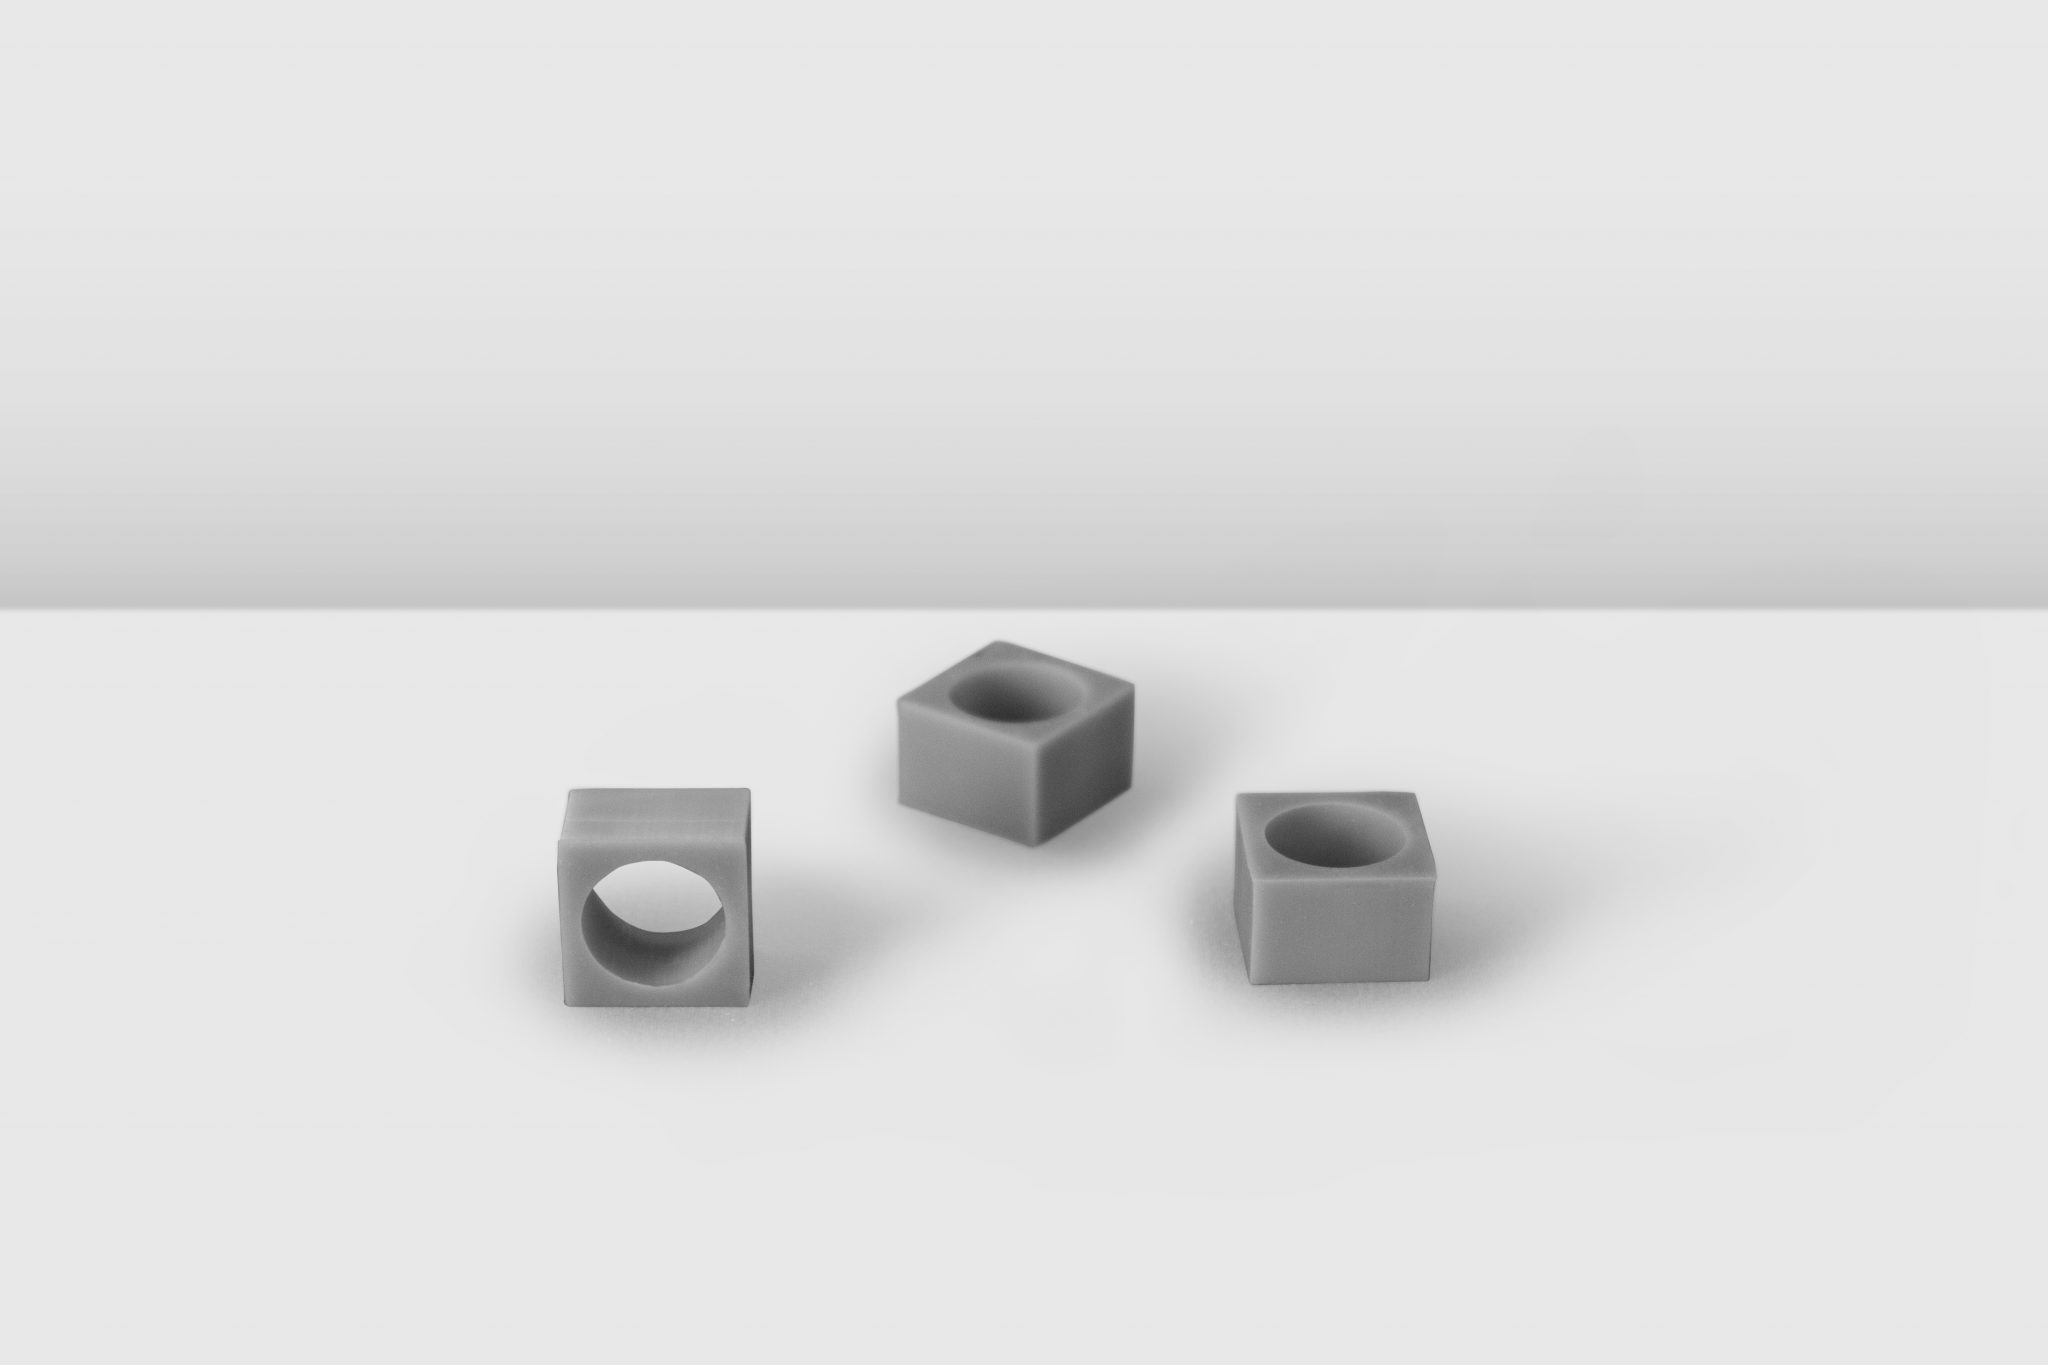 Square test print.